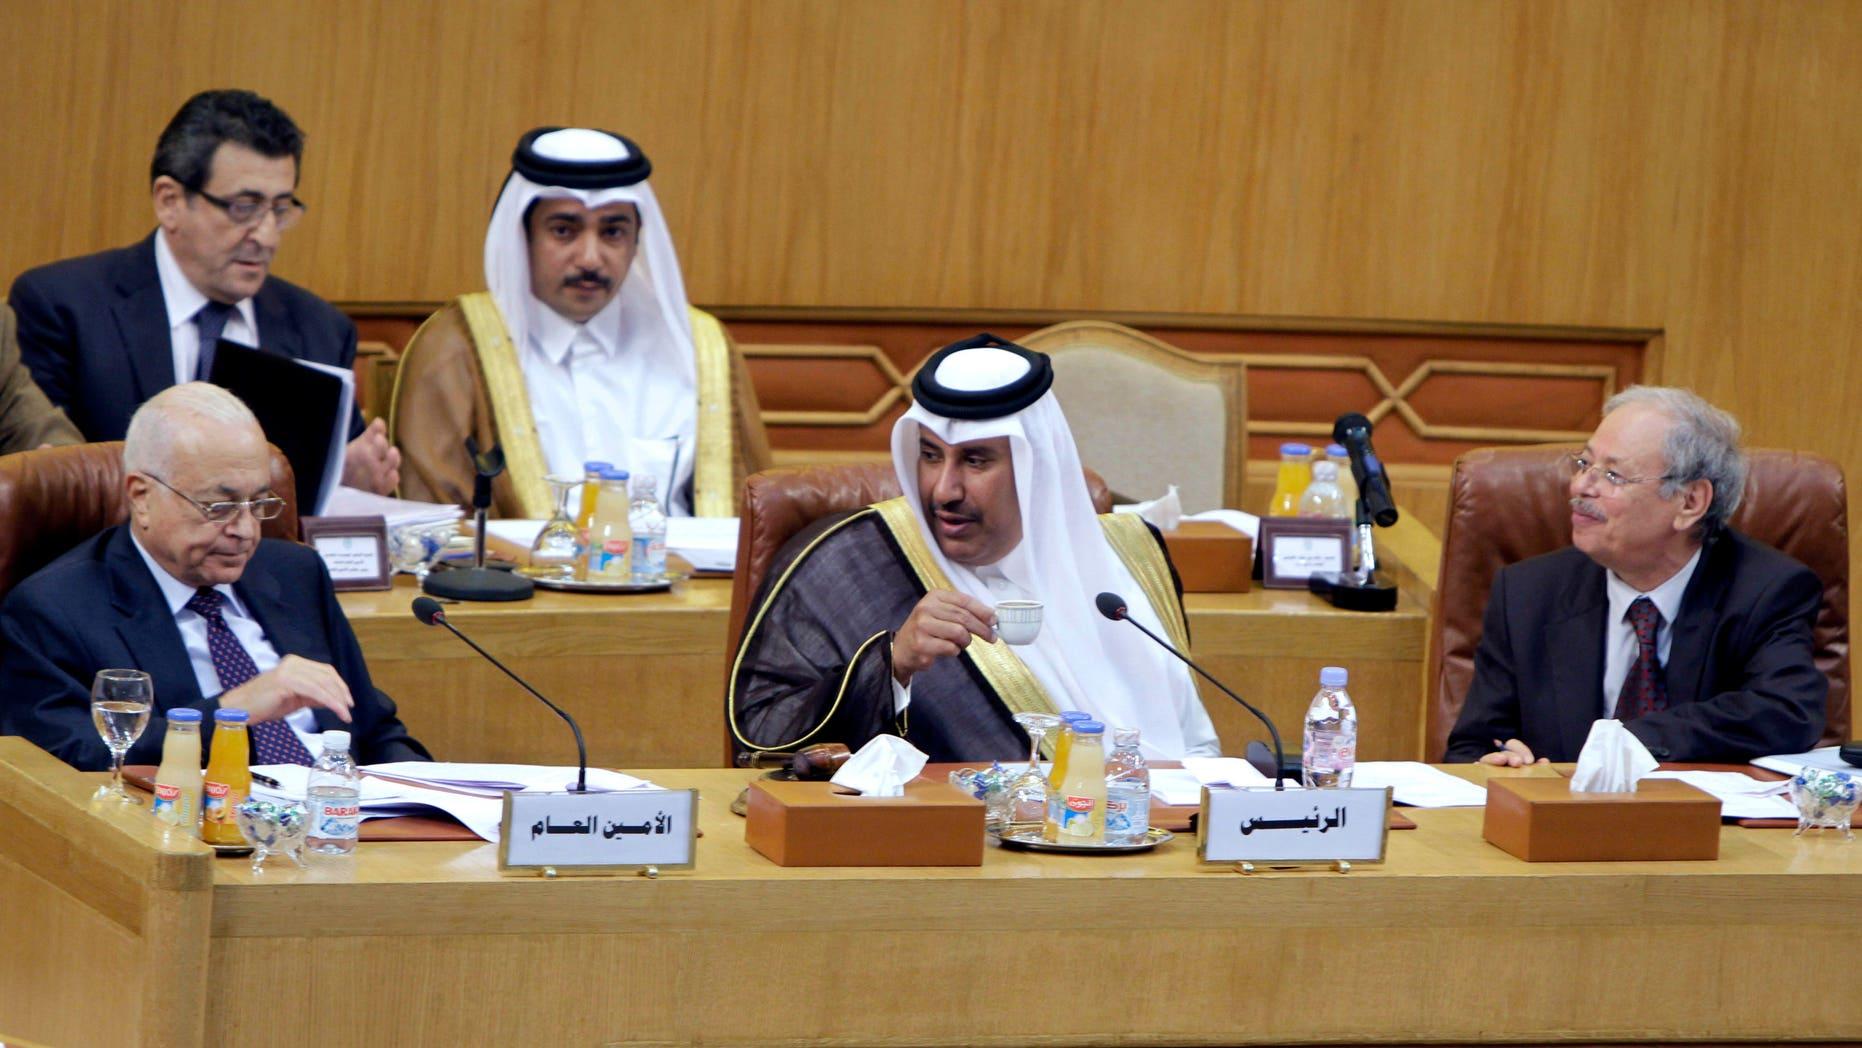 Nov. 12, 2011: Qatari Foreign Minister Hamad bin Jasim, center, looks at Arab League secretary-general Nabil al-Arabi Nabil, left, during an Arab League emergency session on Syria at the Arab League headquarters in Cairo, Egypt.